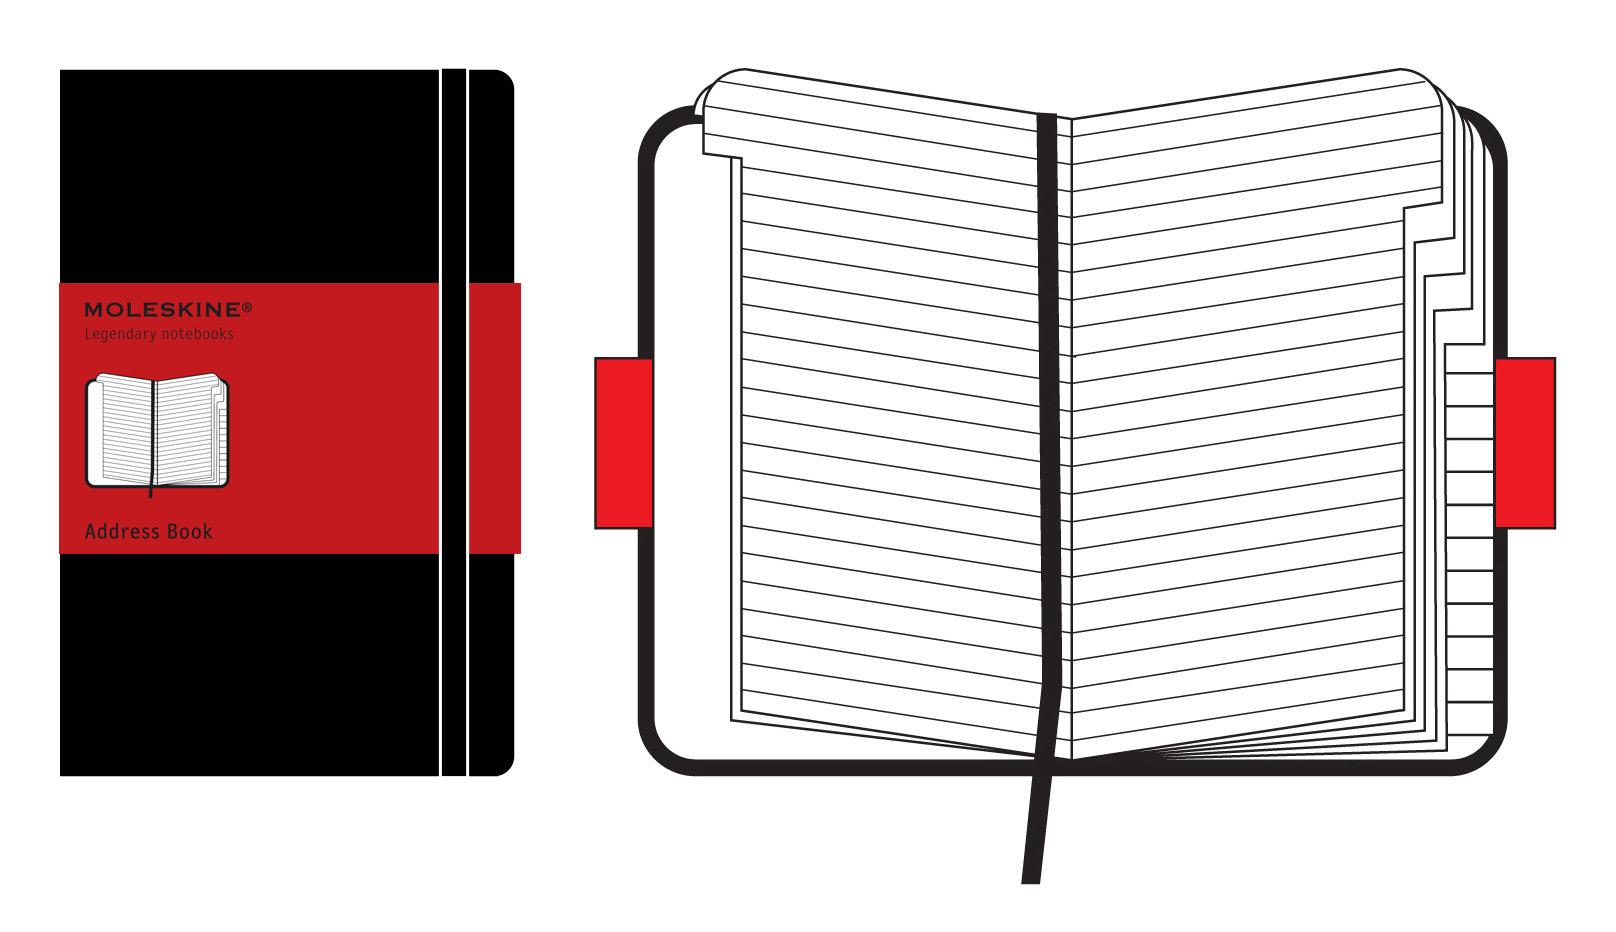 Index of /RAWIMAGE/Completed/moleskine/black_notebooks_icons